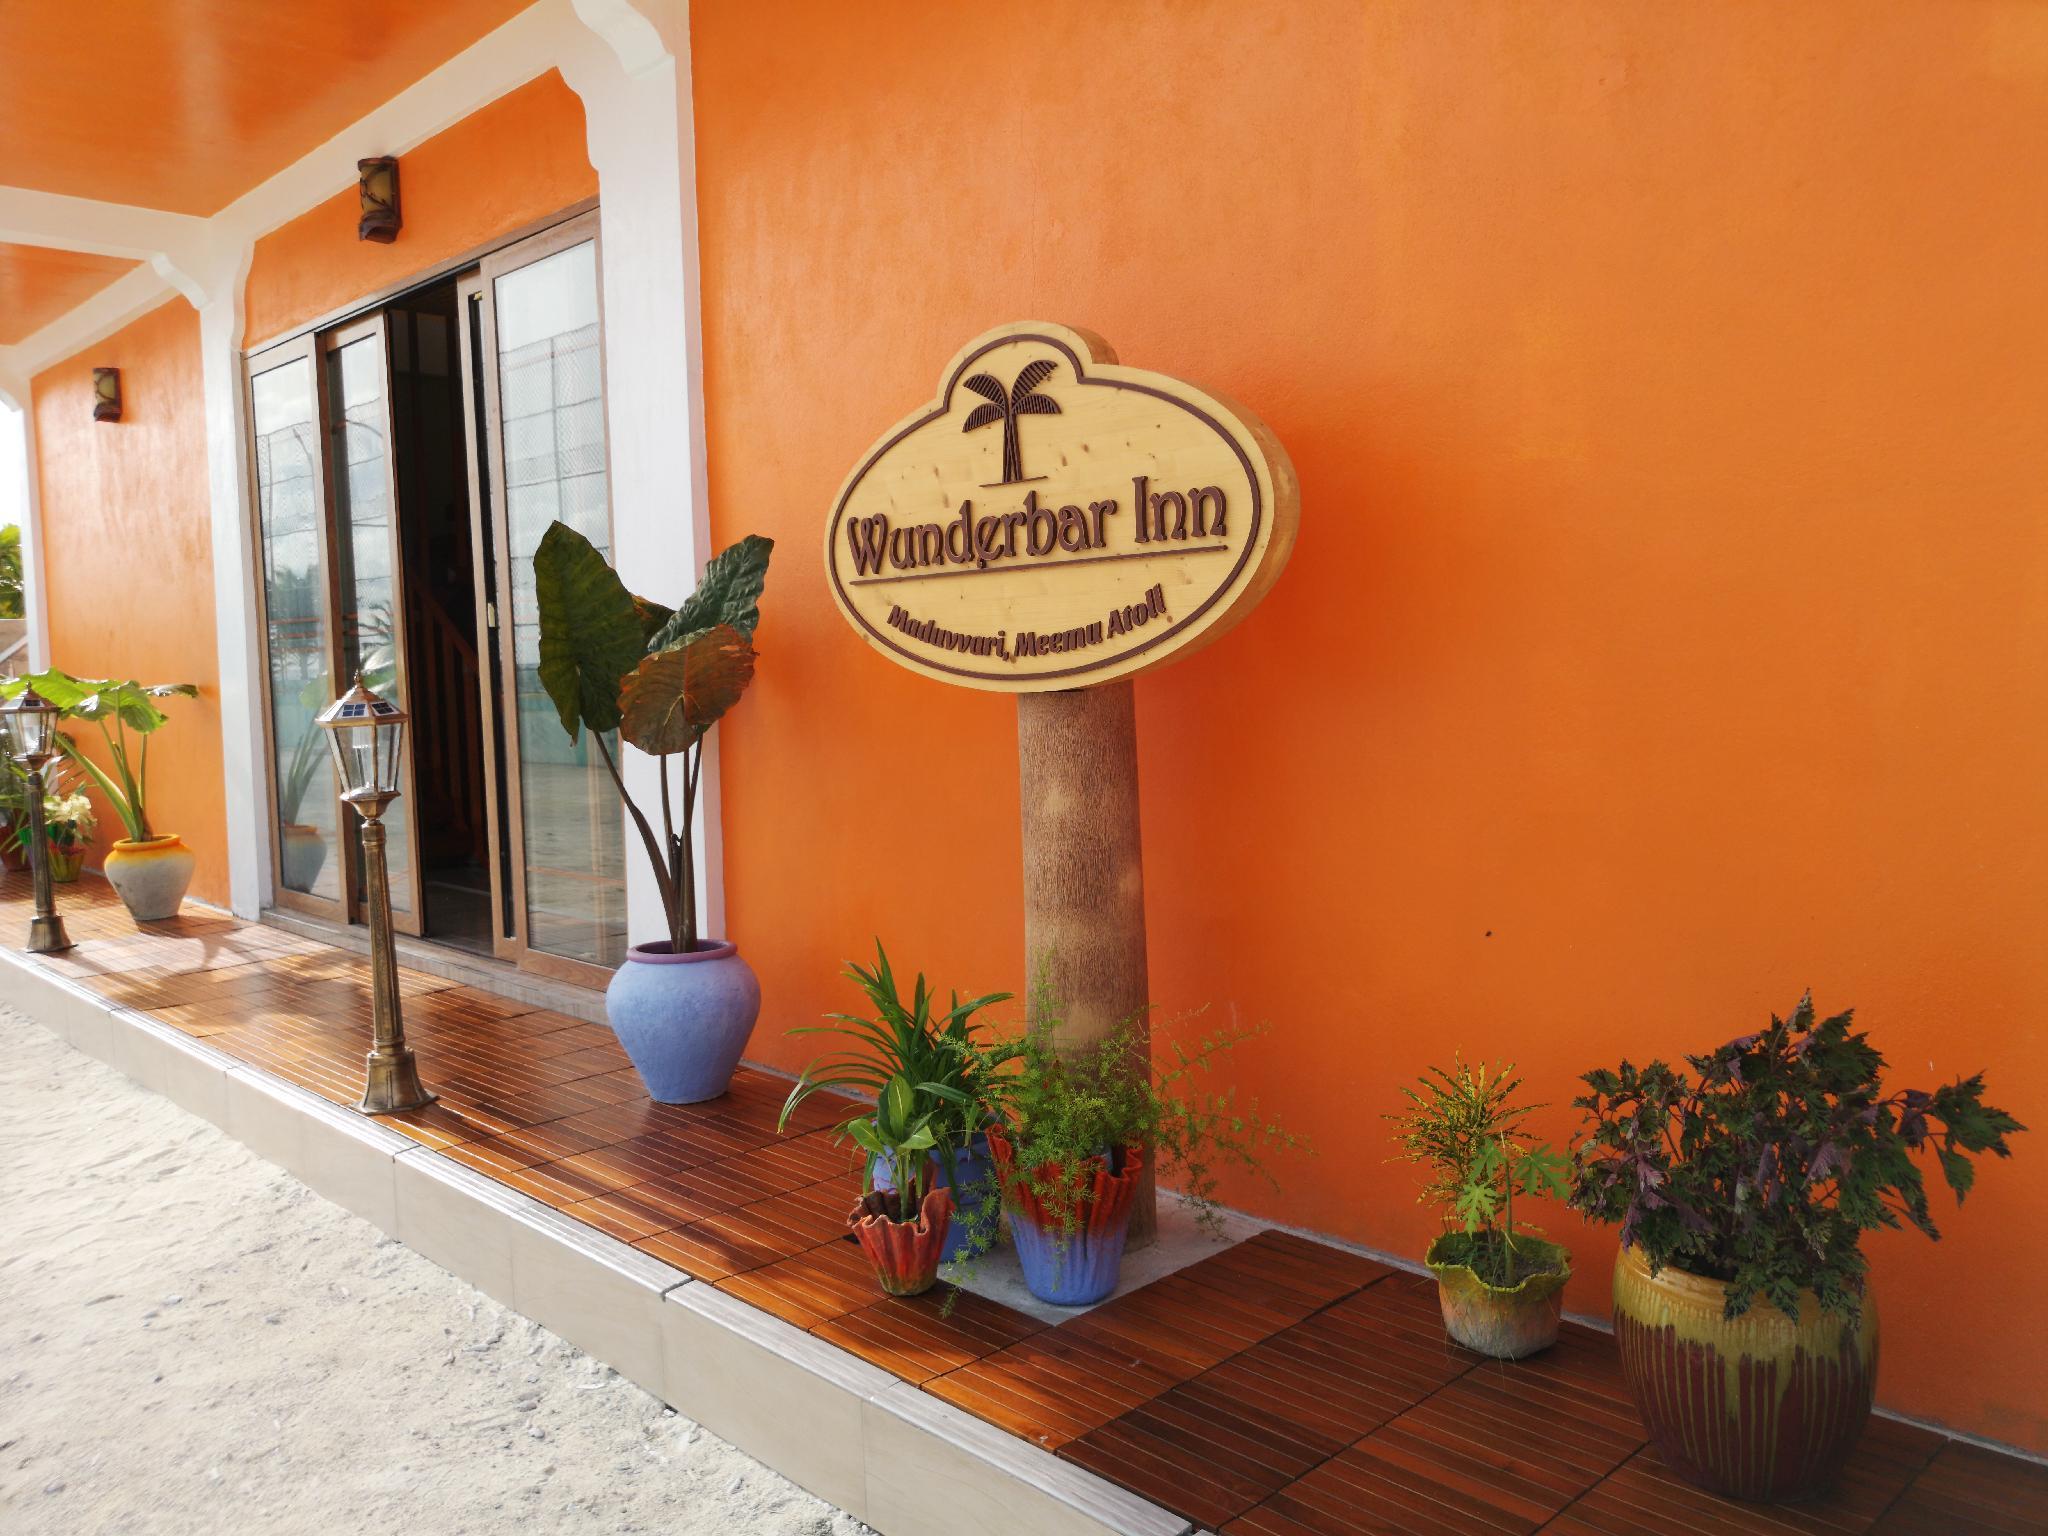 Wunderbar Inn